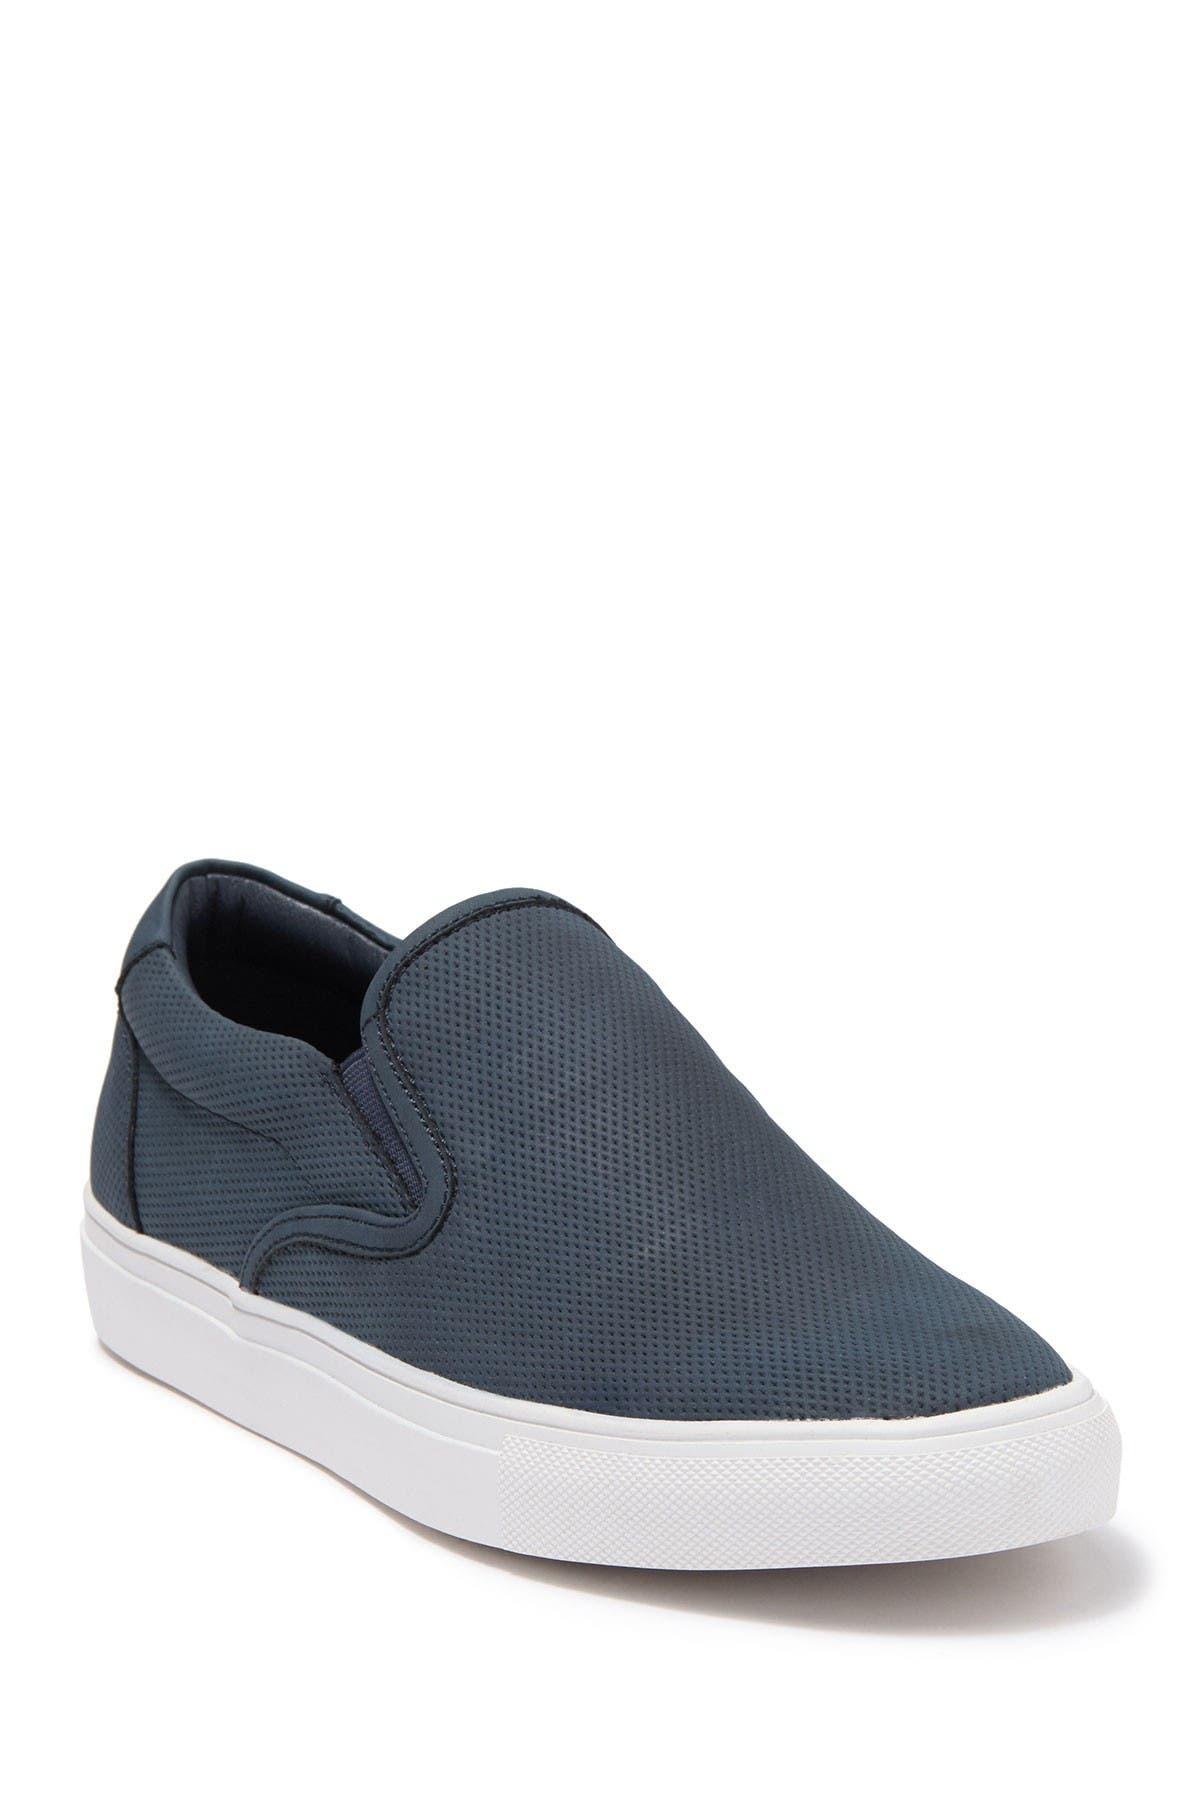 14th & Union Ralan Slip-On Sneaker